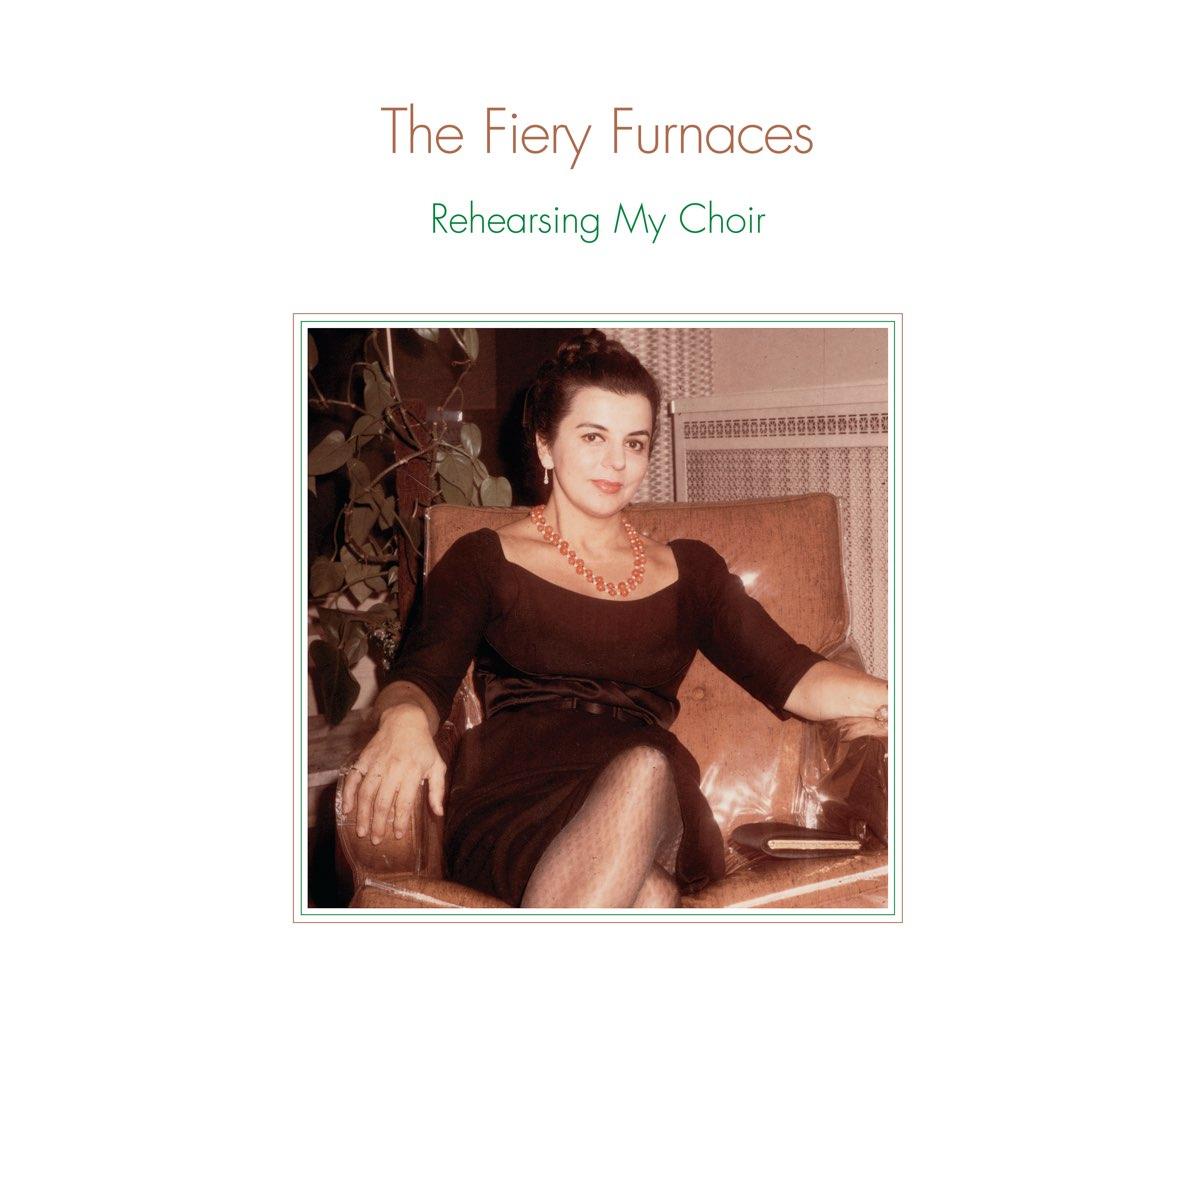 The Fiery Furnaces, Rehearsing My Choir